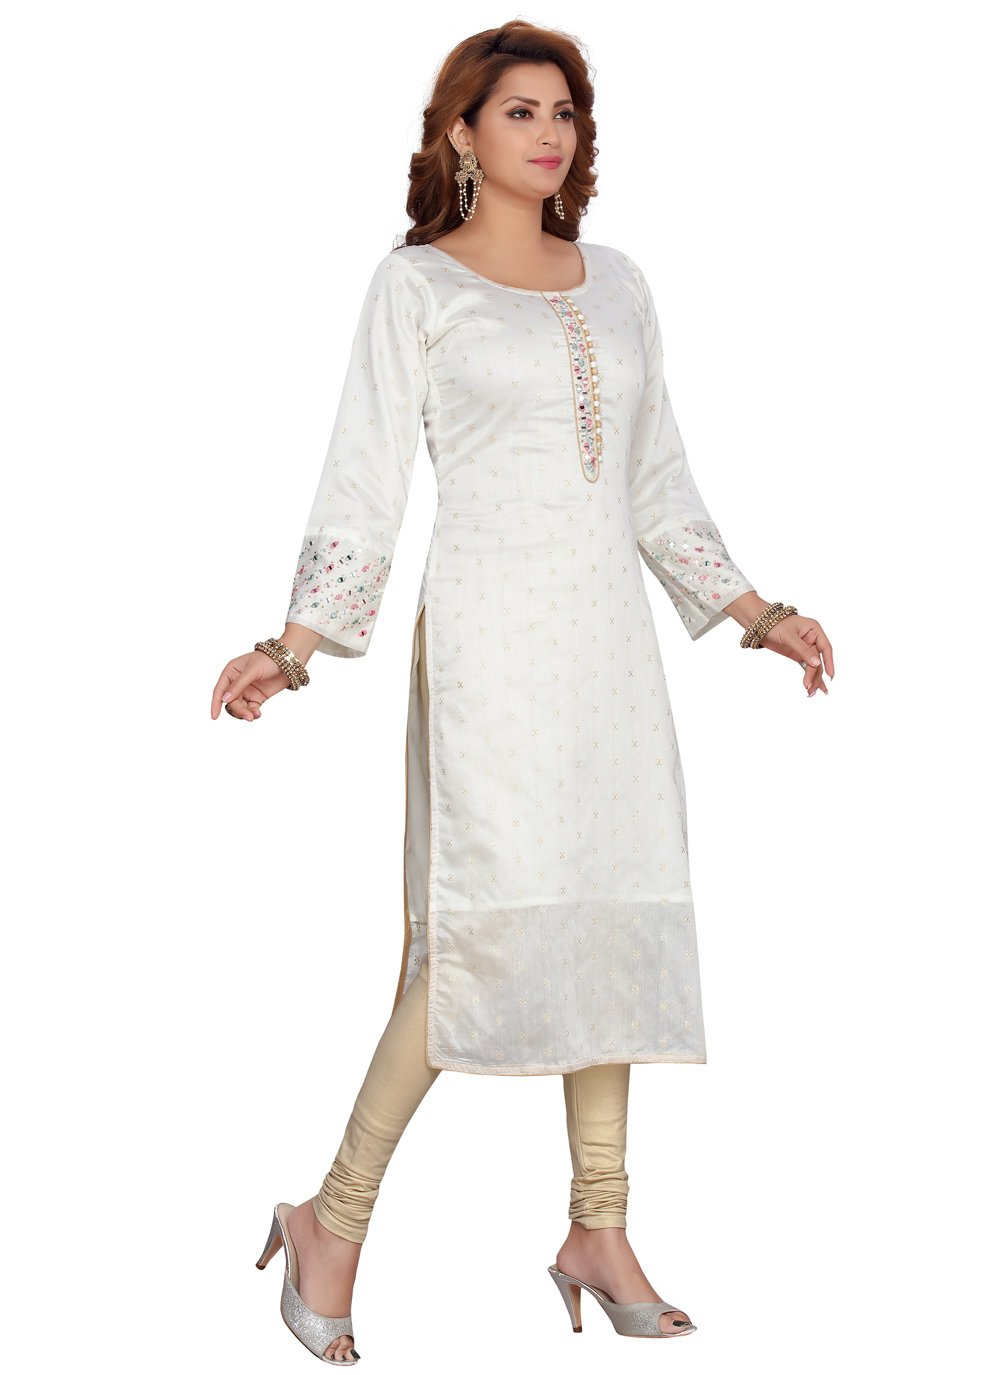 Off White Chanderi Party Wear Kurti